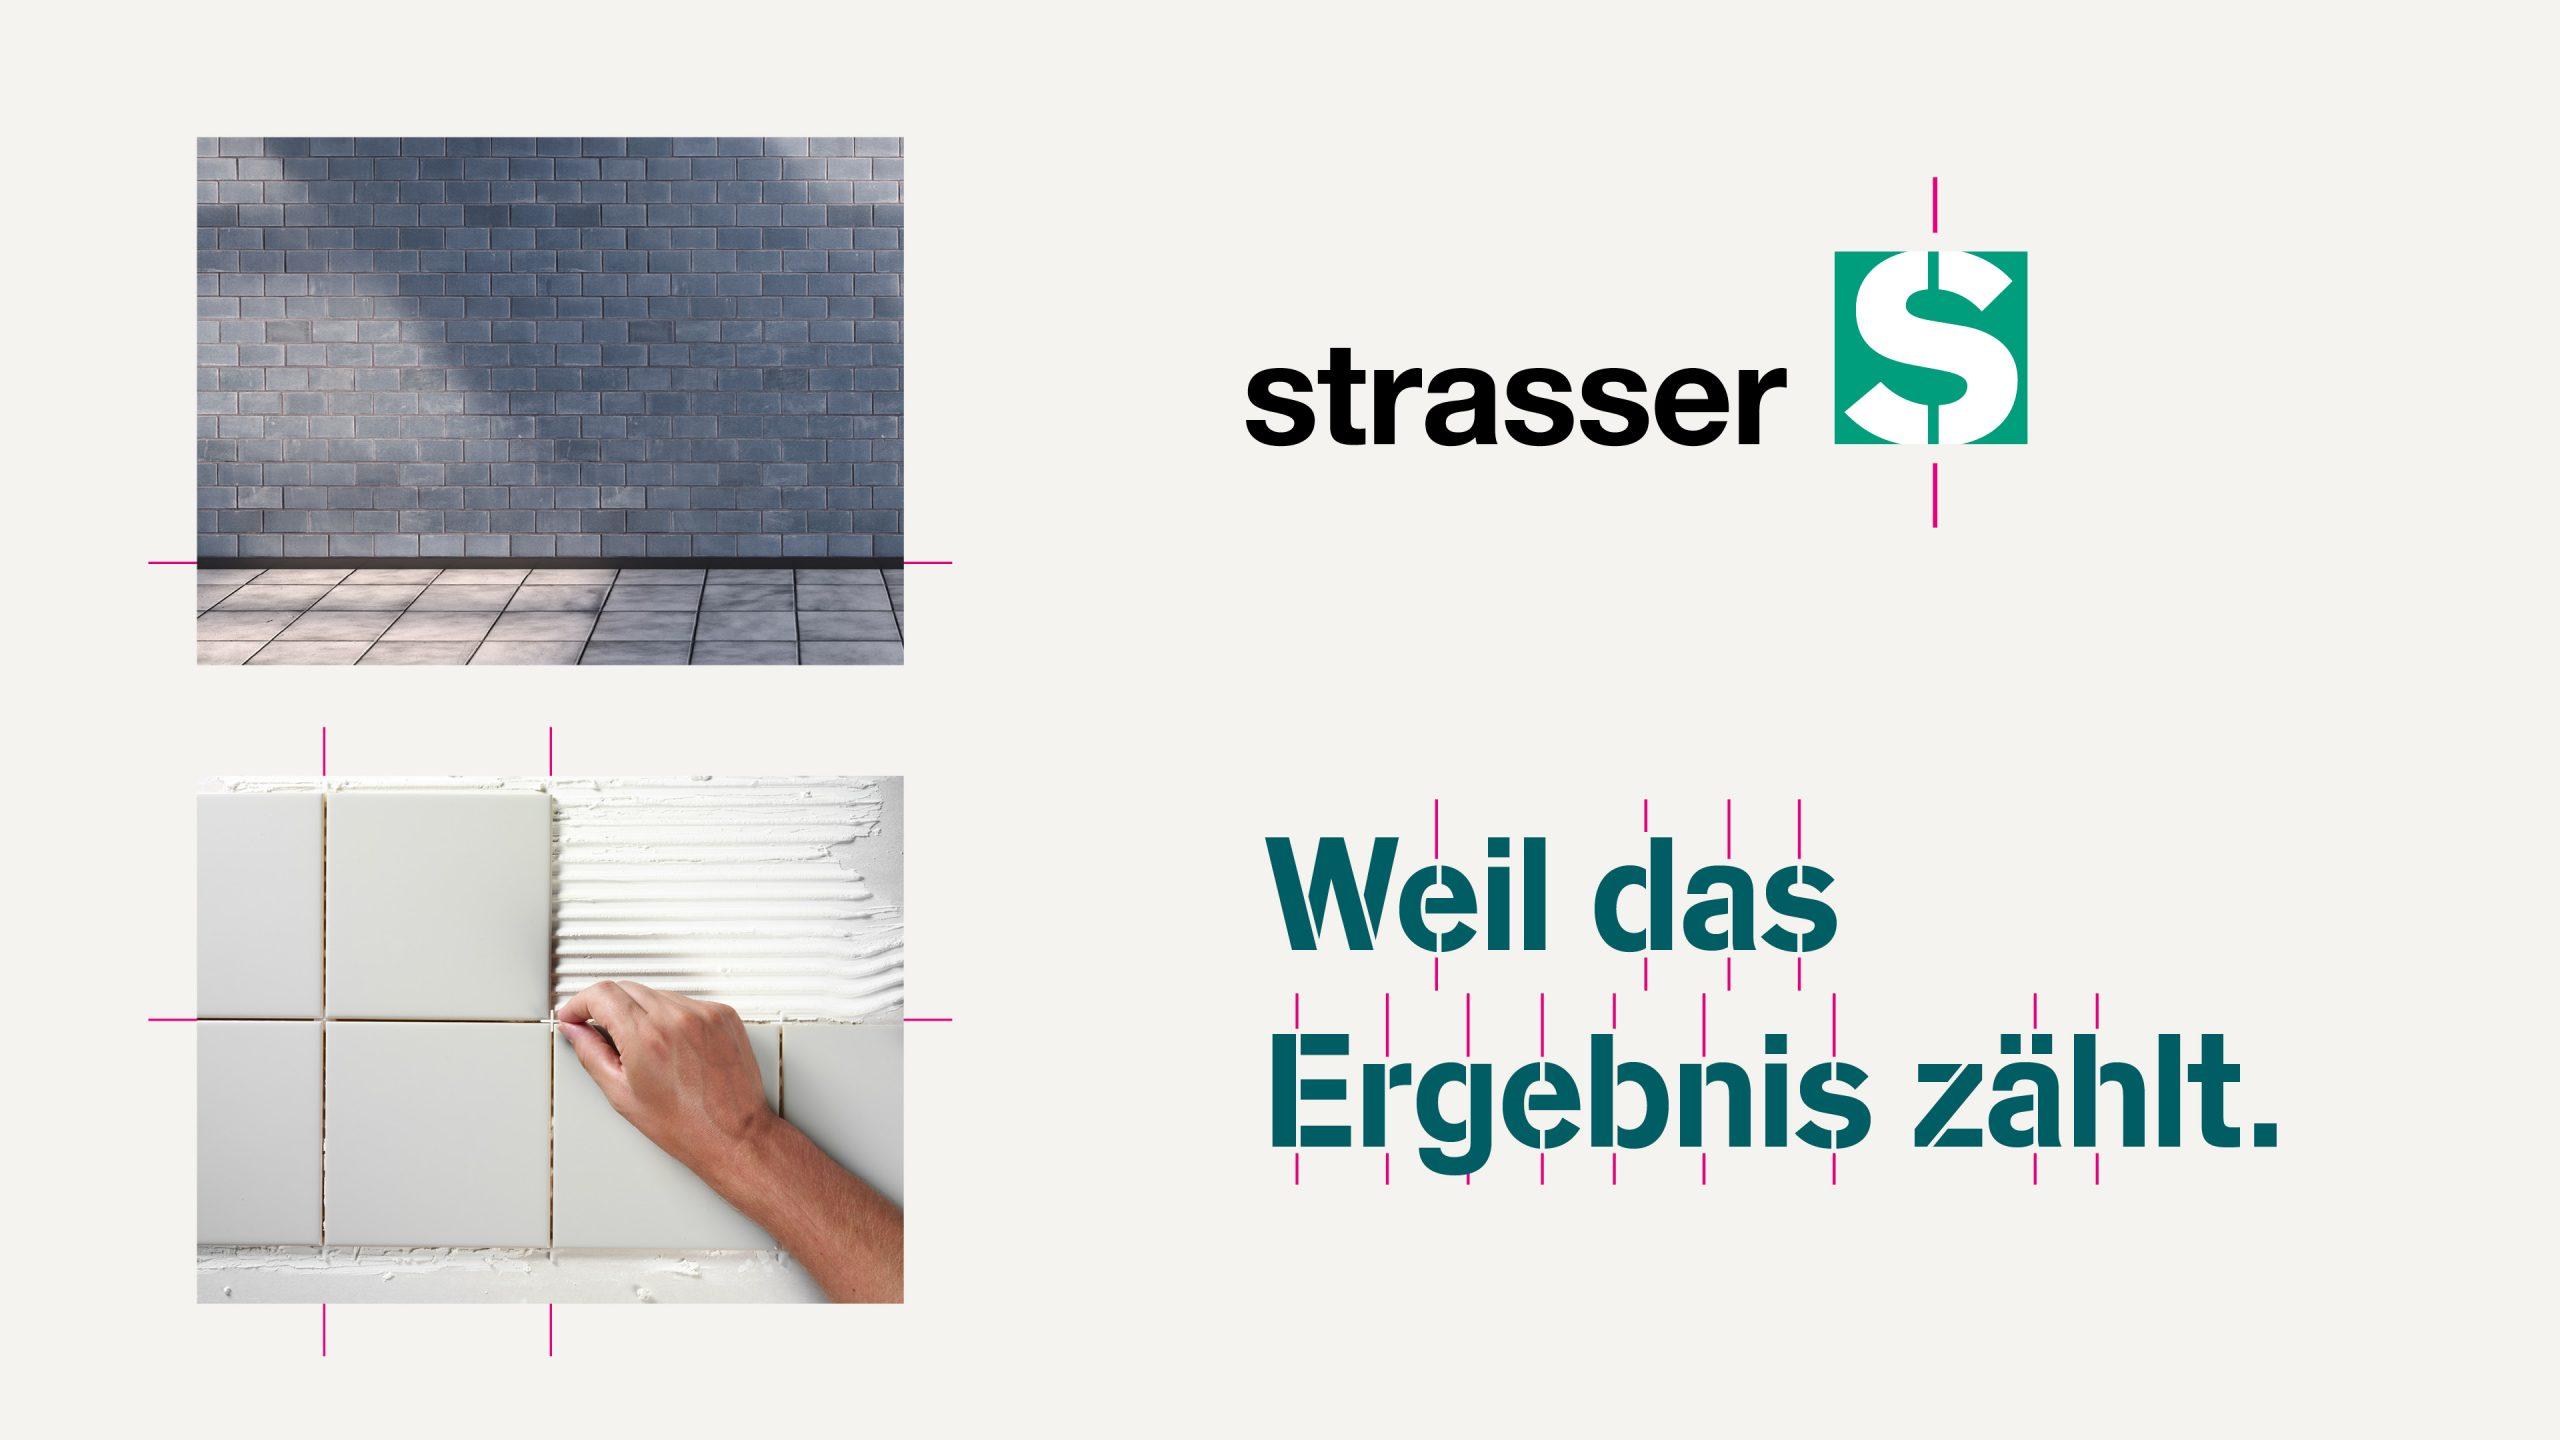 strasser design system